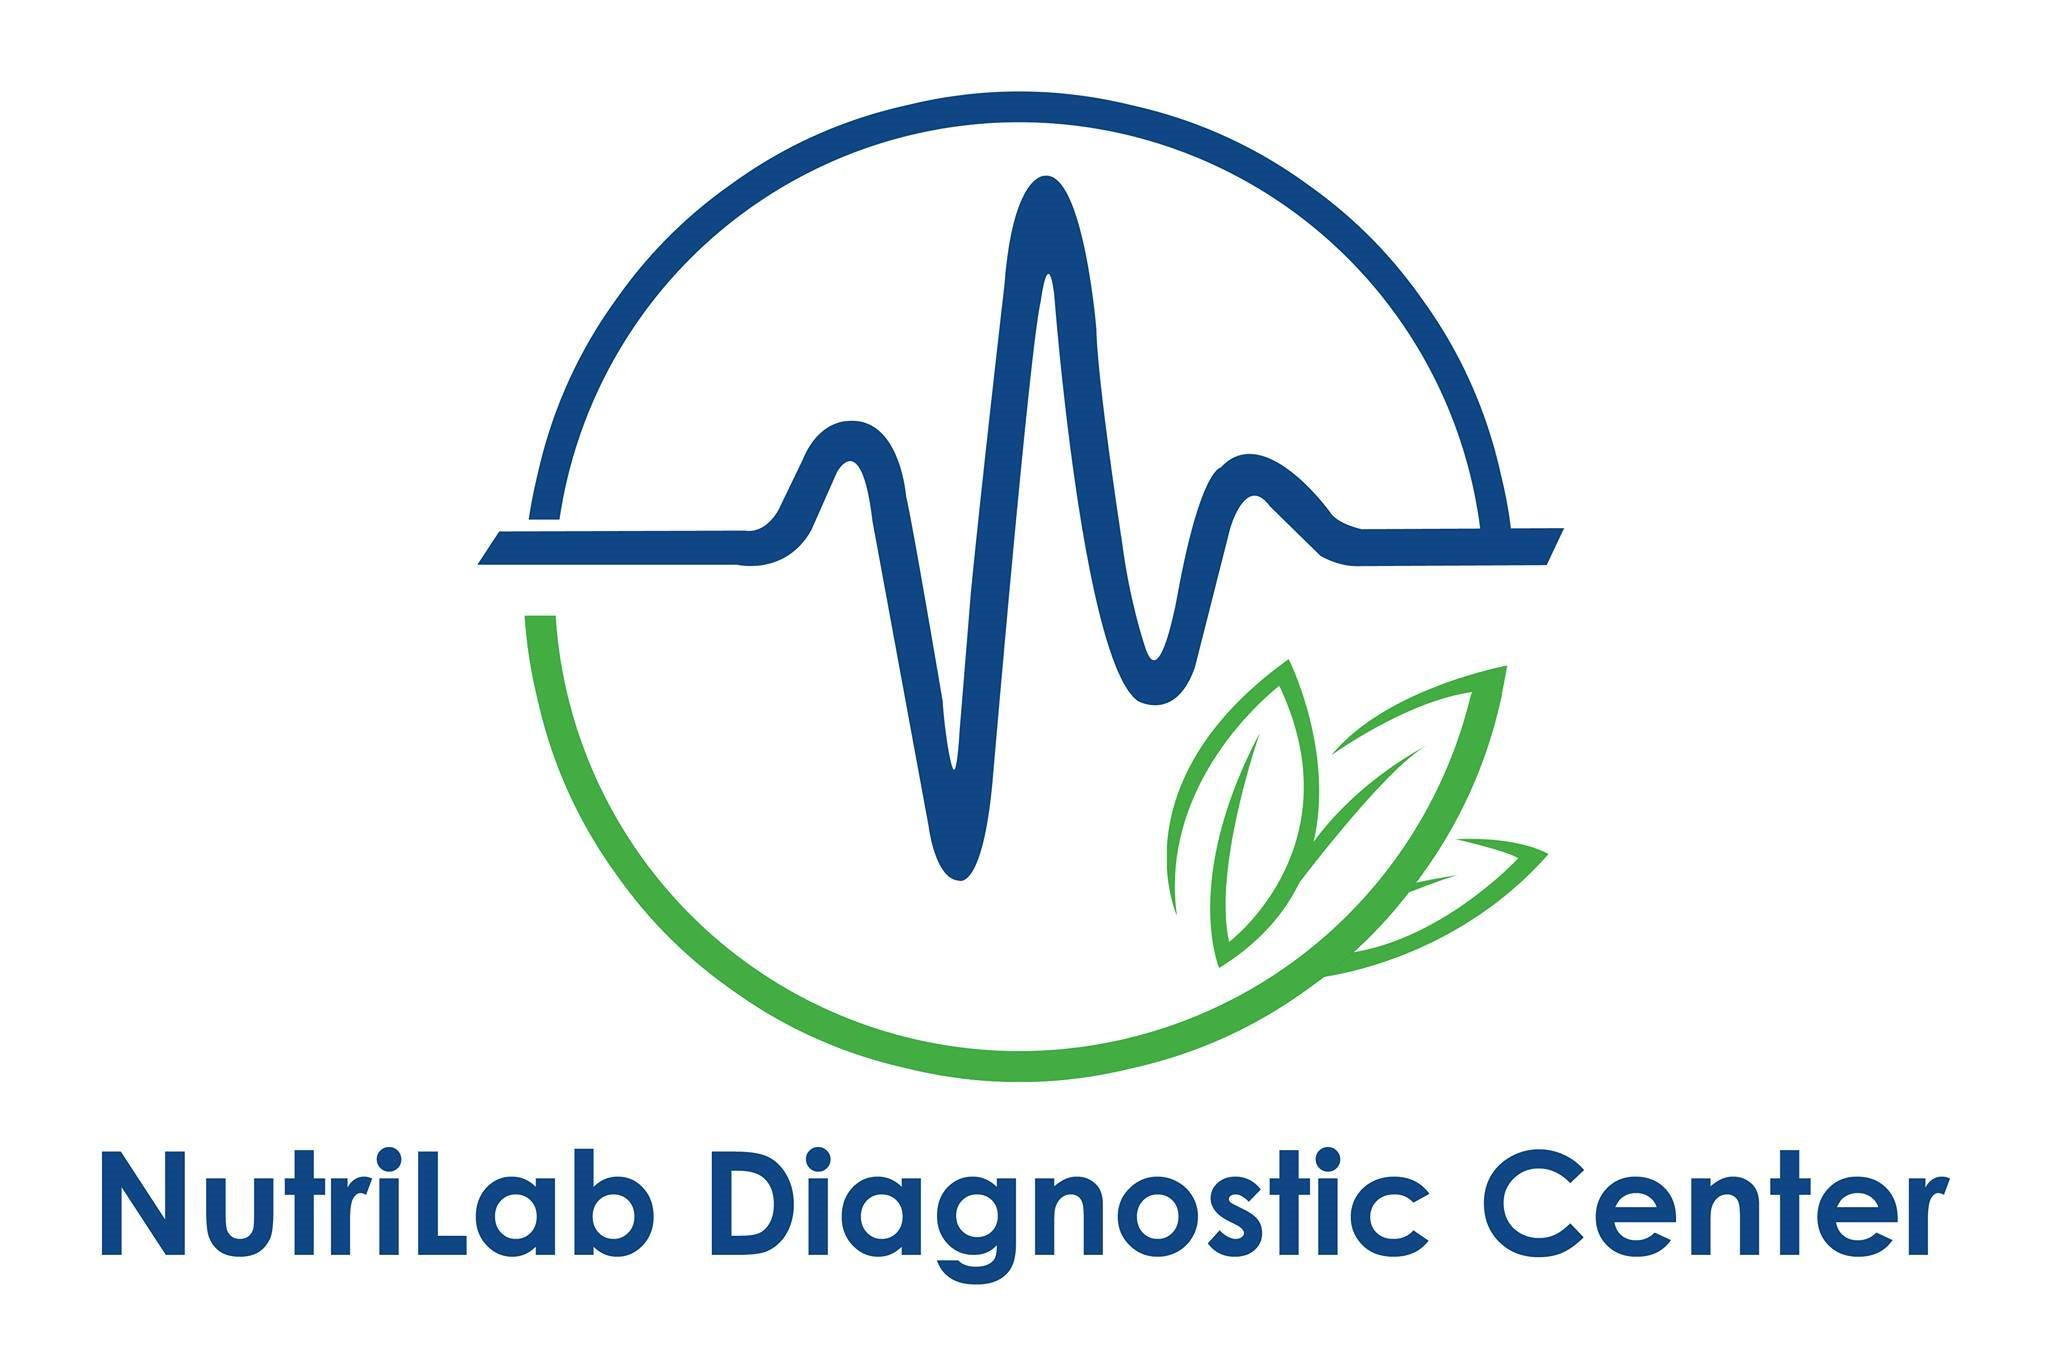 Nutrilab Diagnostic Center